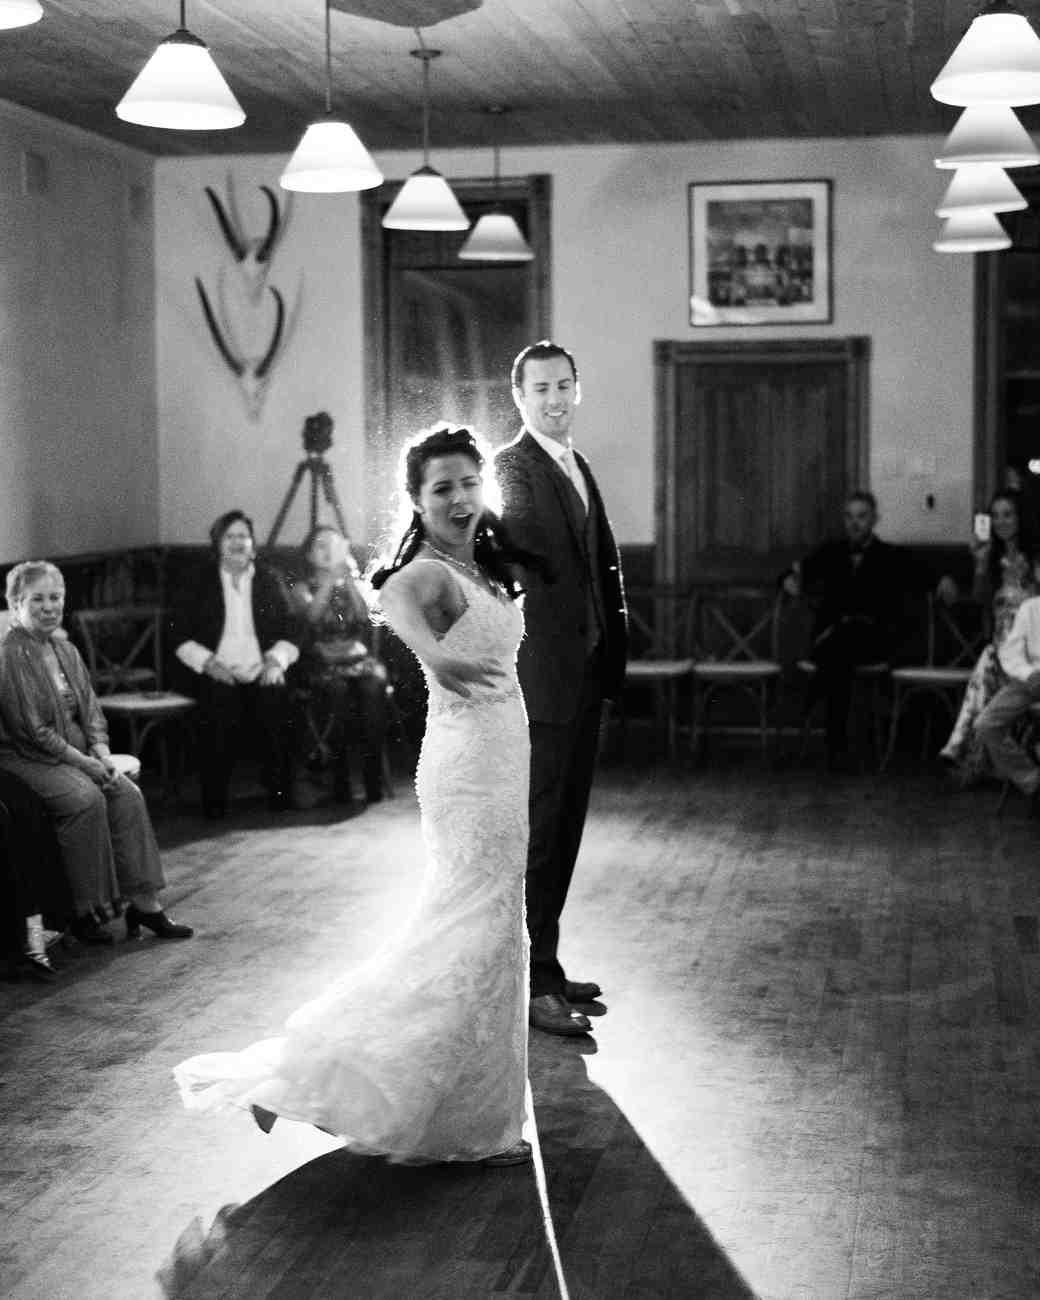 meshach-warren-wedding-firstdance-0844-6134942-0716.jpg